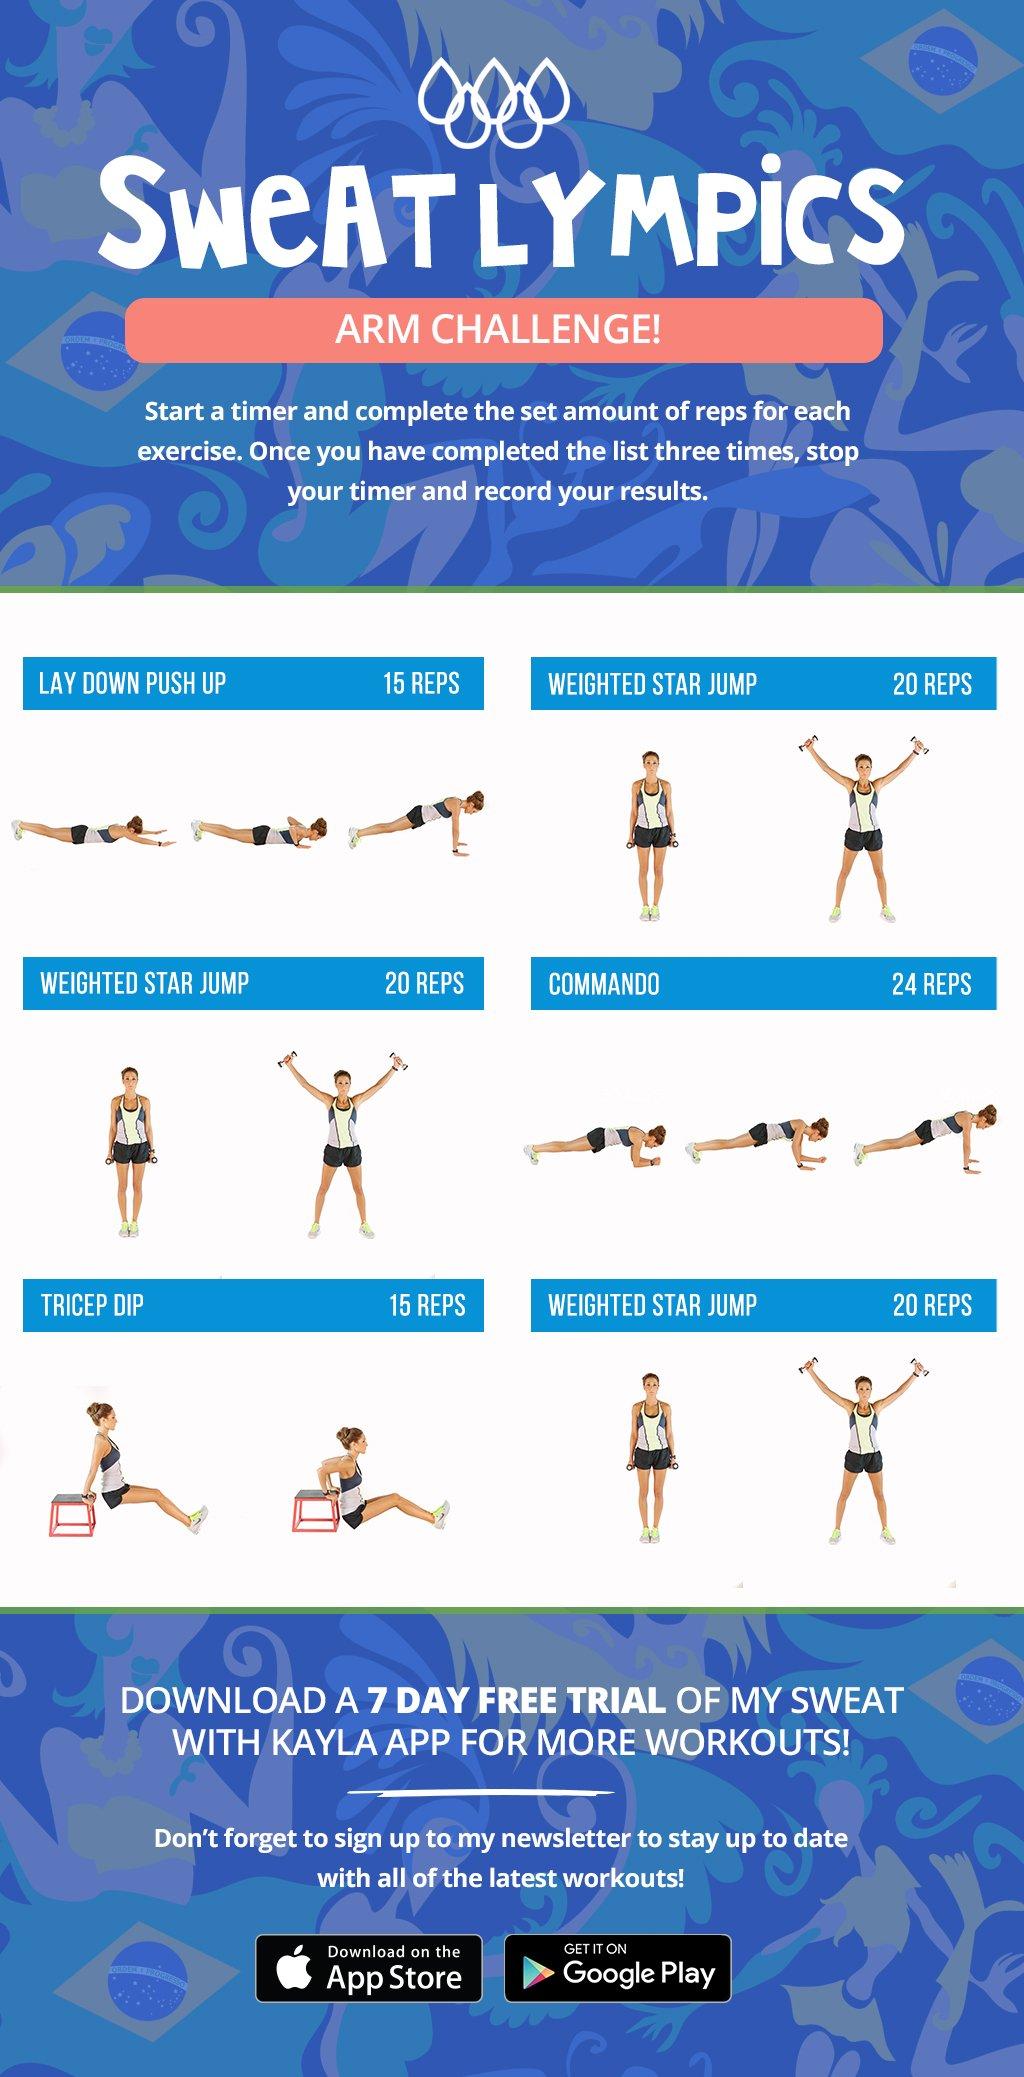 Sweatlympics Arm Challenge!